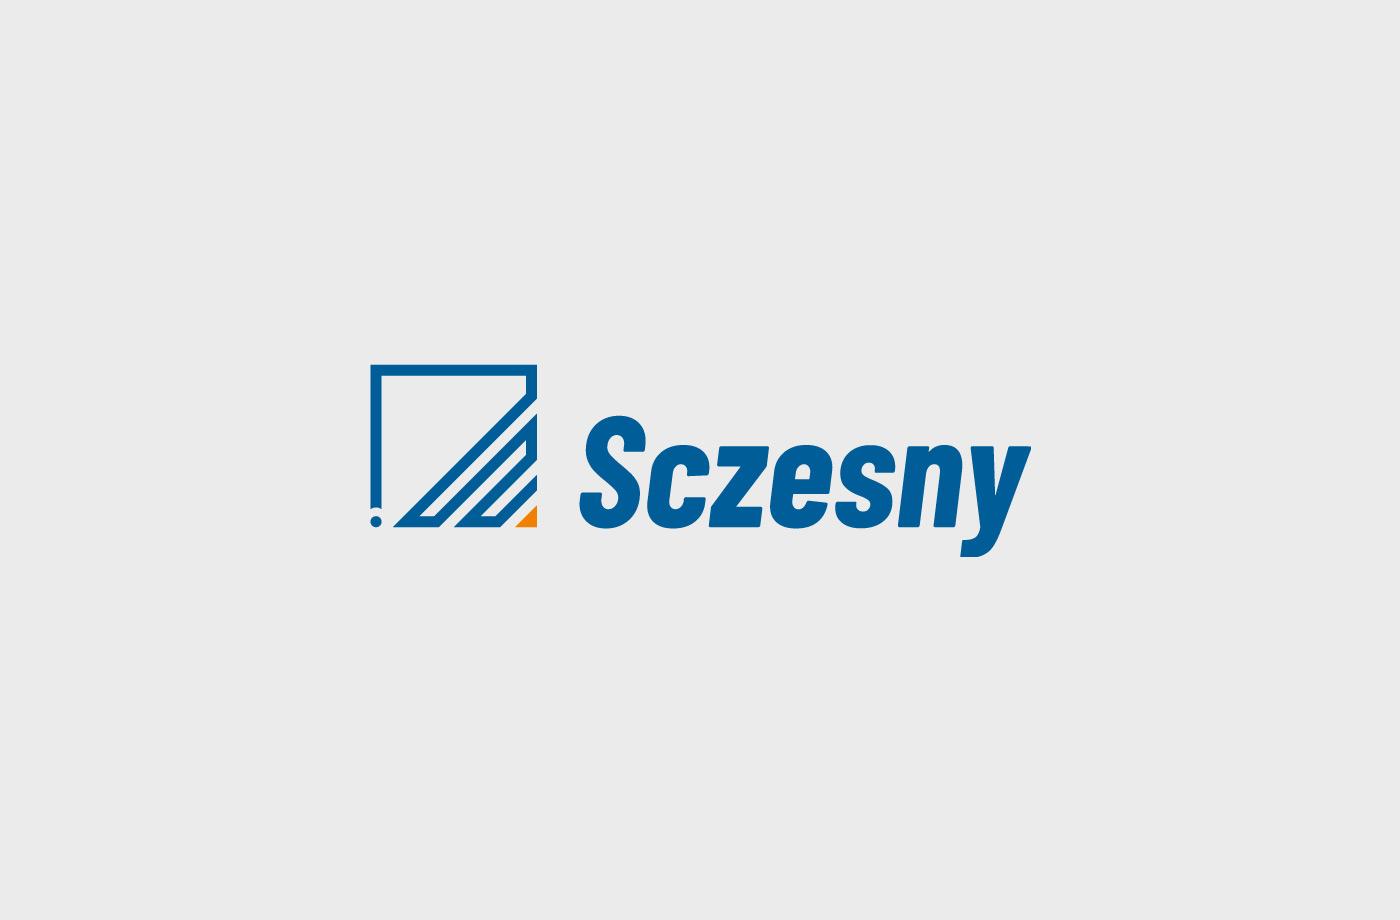 ci-sczesny-logovarianten-4